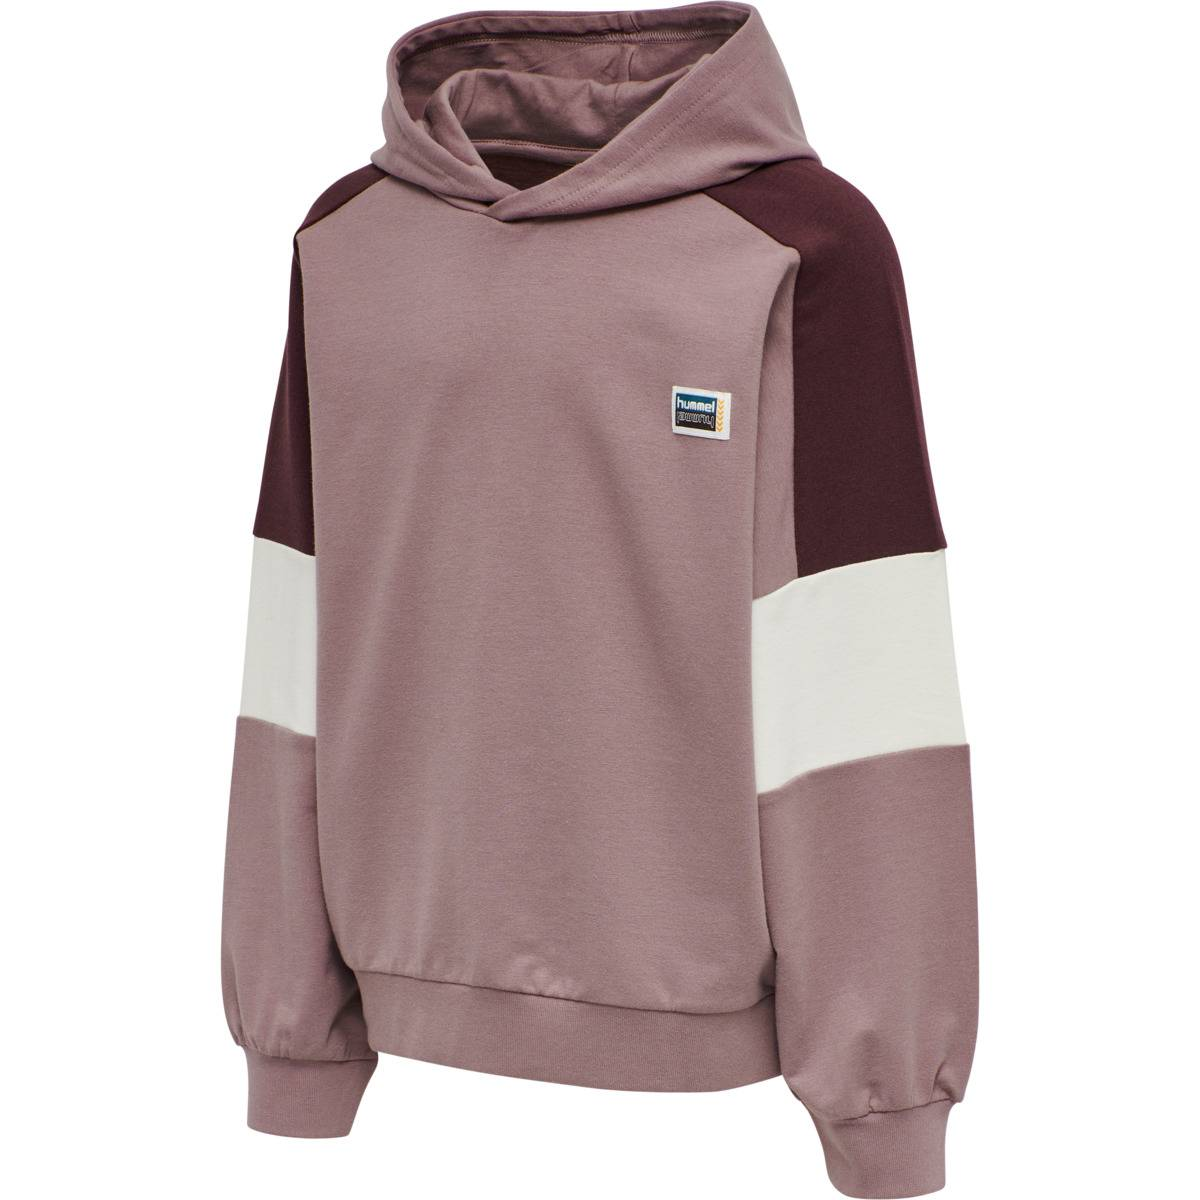 Hummel Mynthe hoodie - twilight mauve